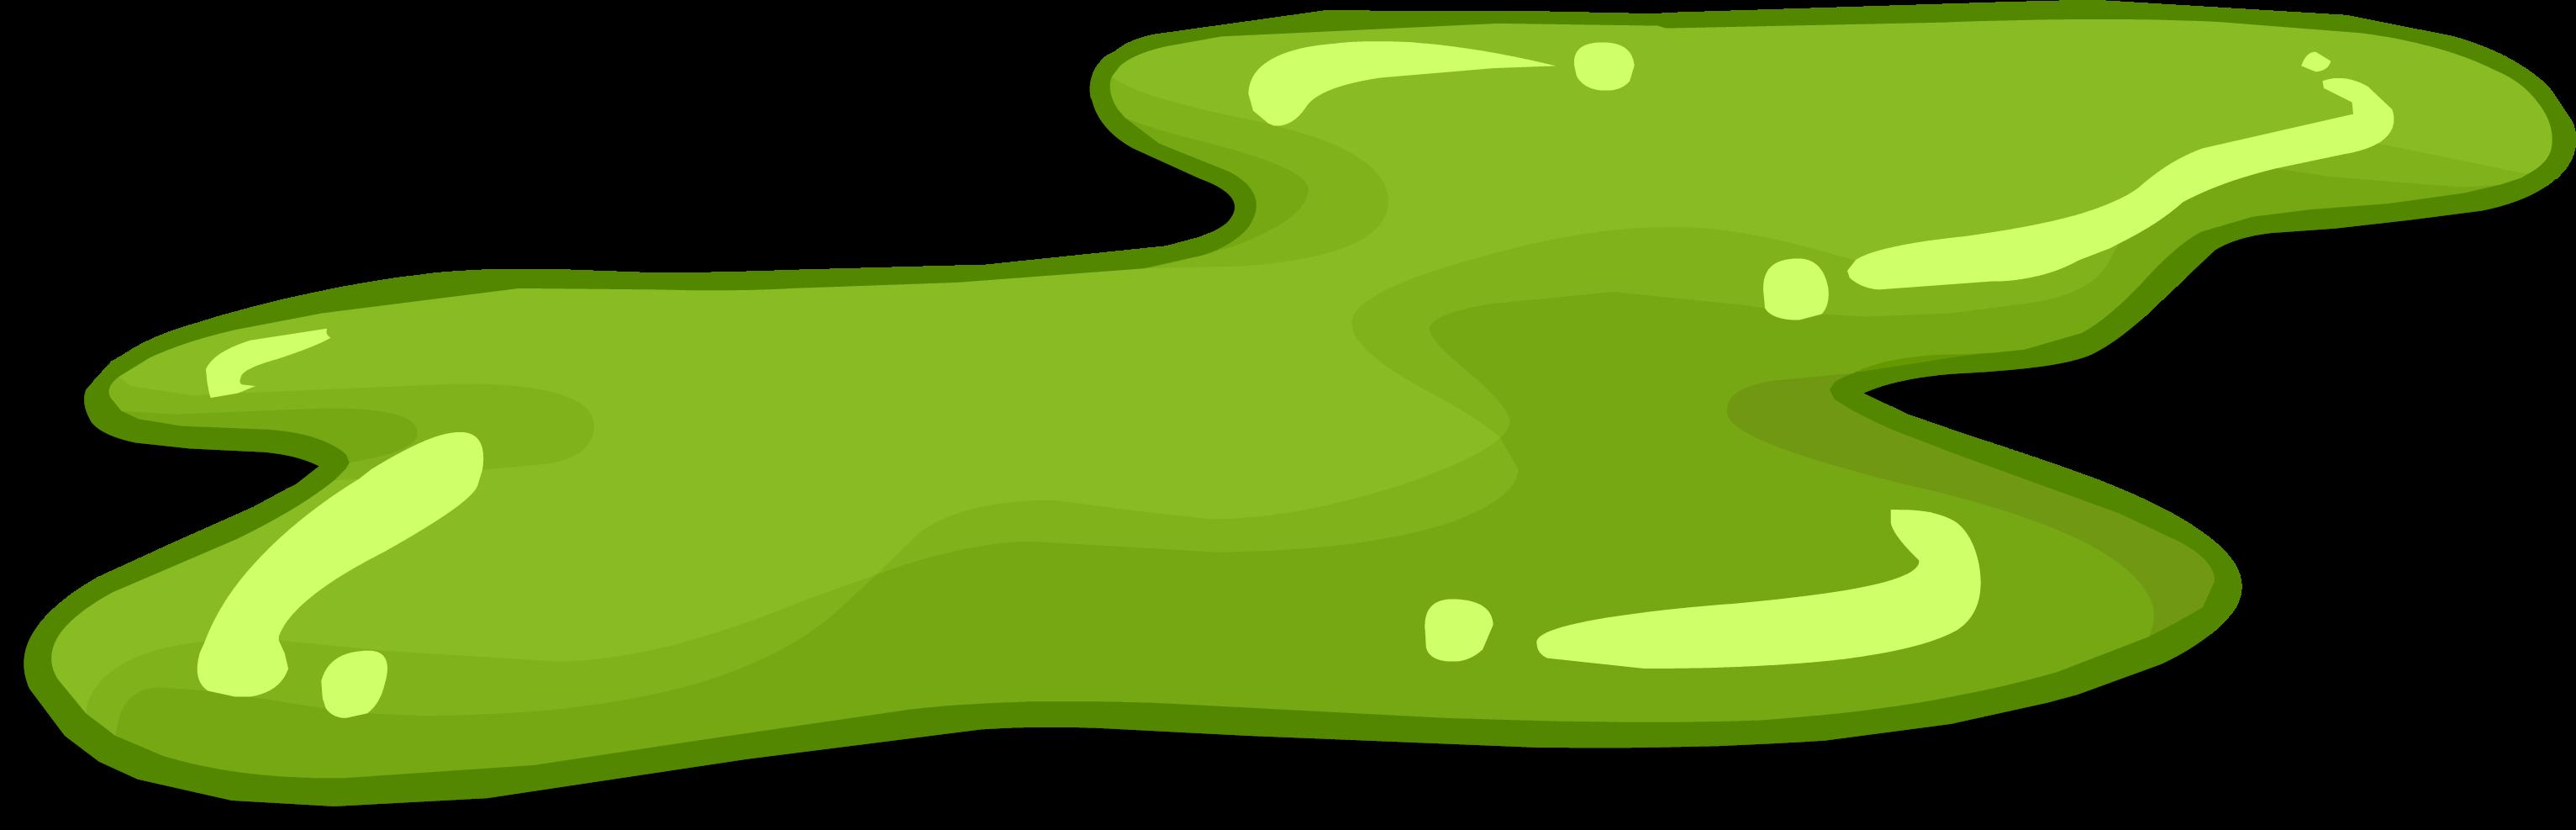 Image pile o goo. Clipart grass golf